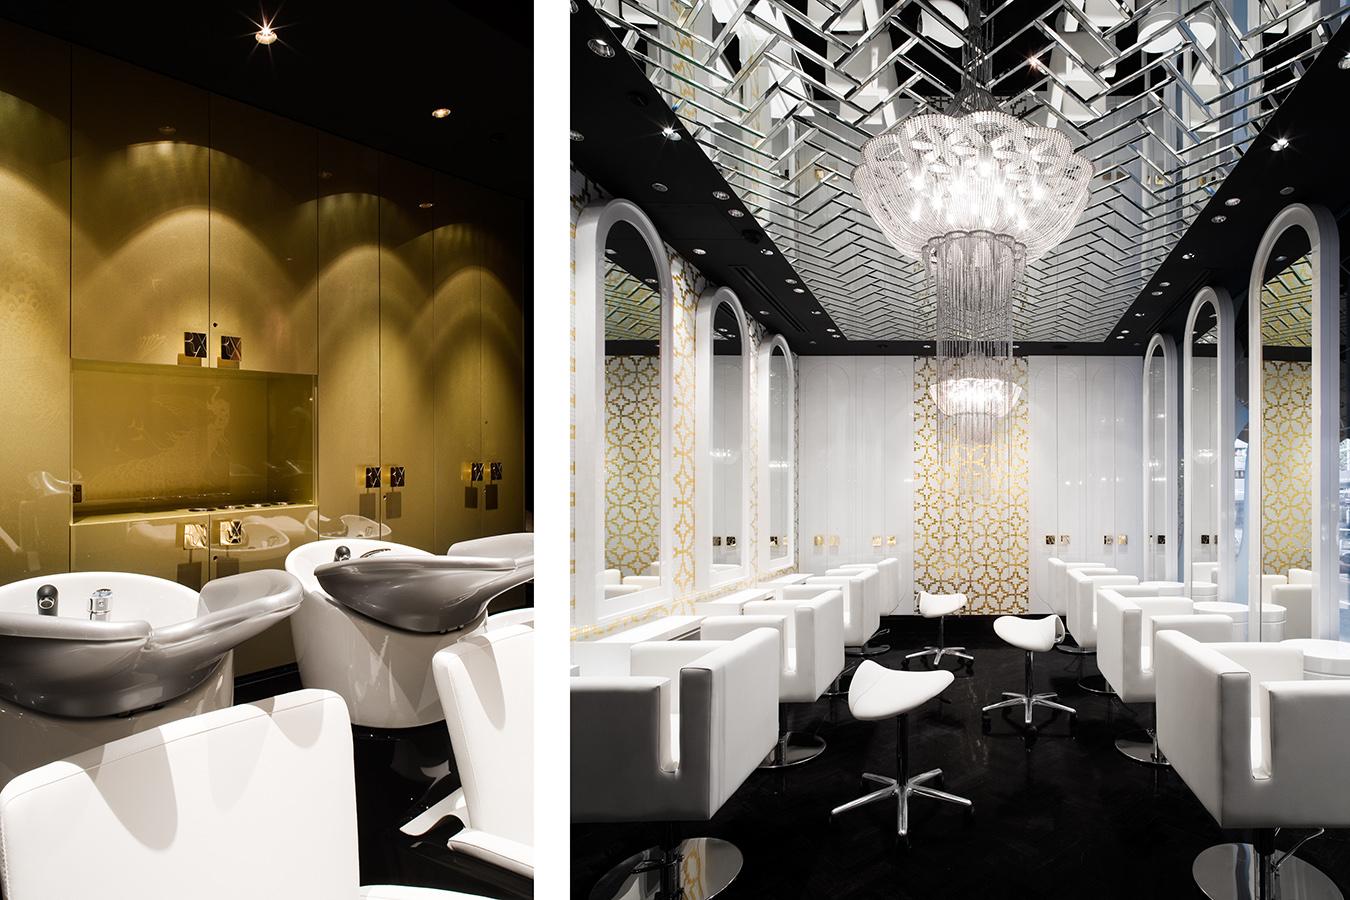 commercial interiors photography renya xydis blainey north.jpg